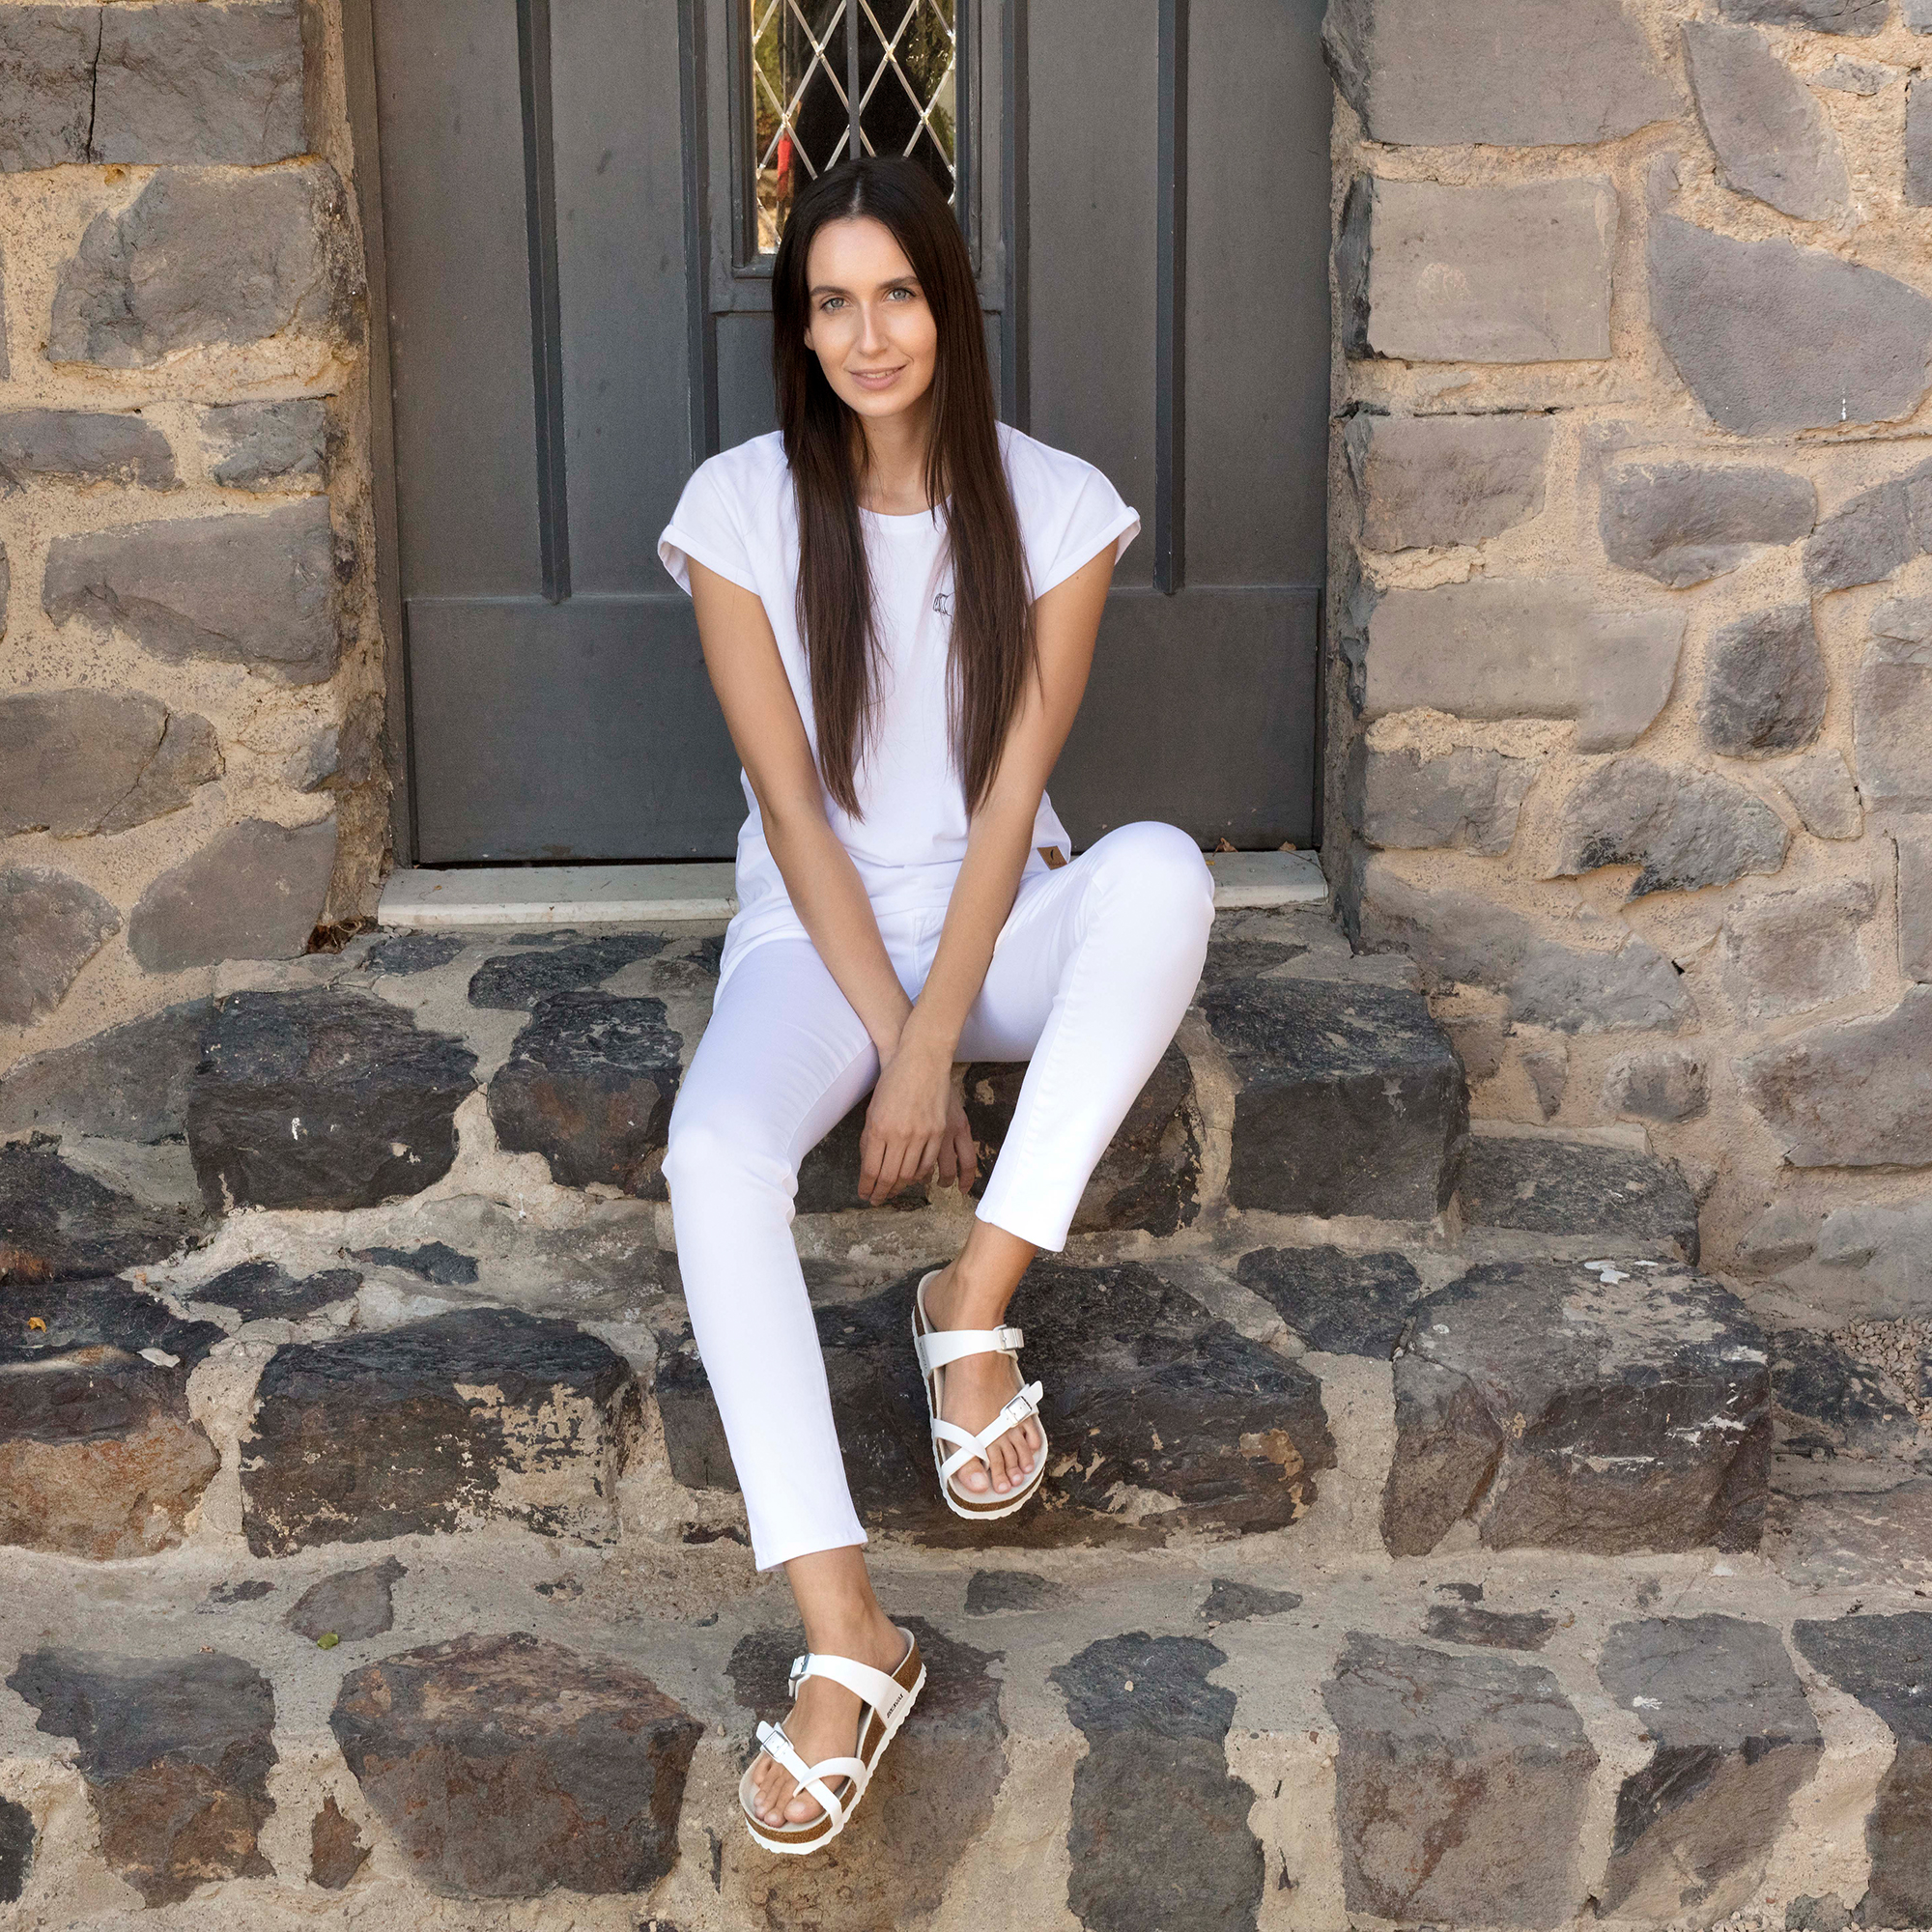 Birkenstock Mayari Sandal Size 42 White, Men's Fashion